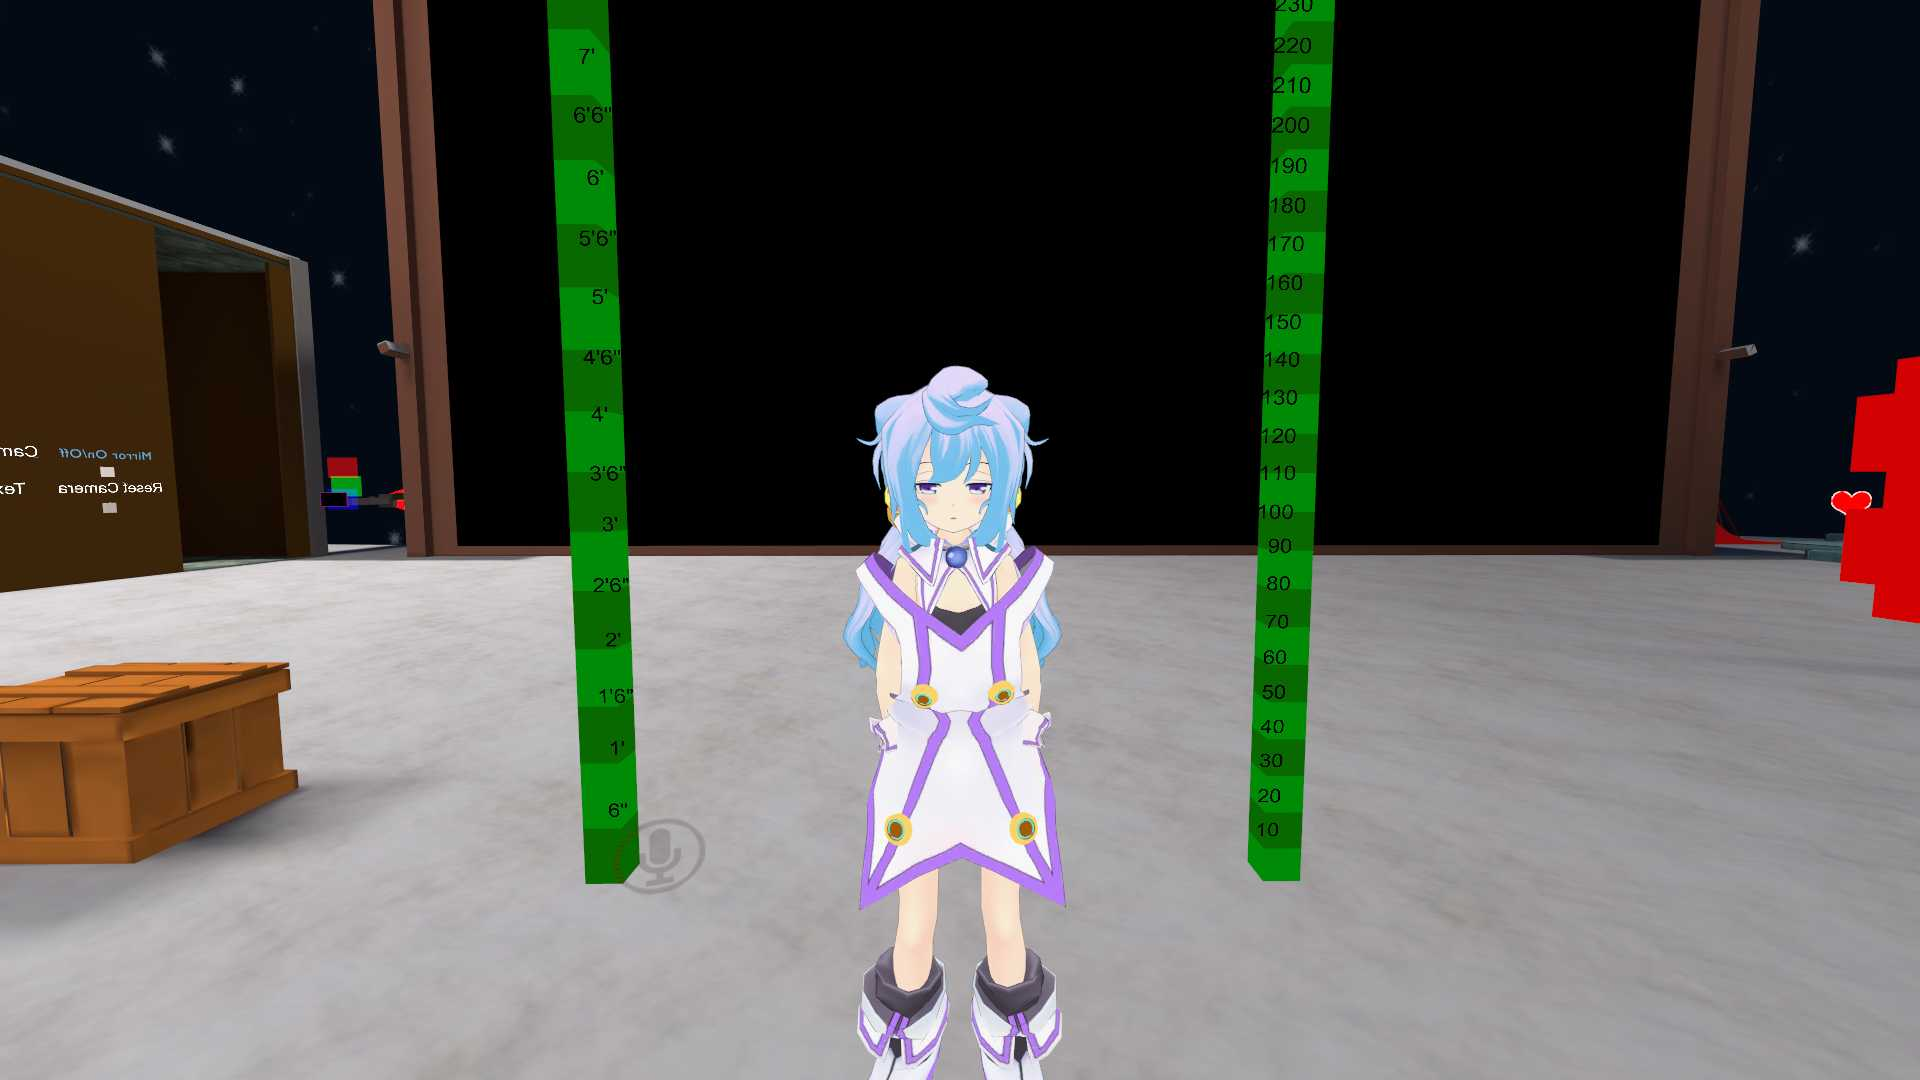 VRCMods - Hacka Doll 3 - VRChat Avatars